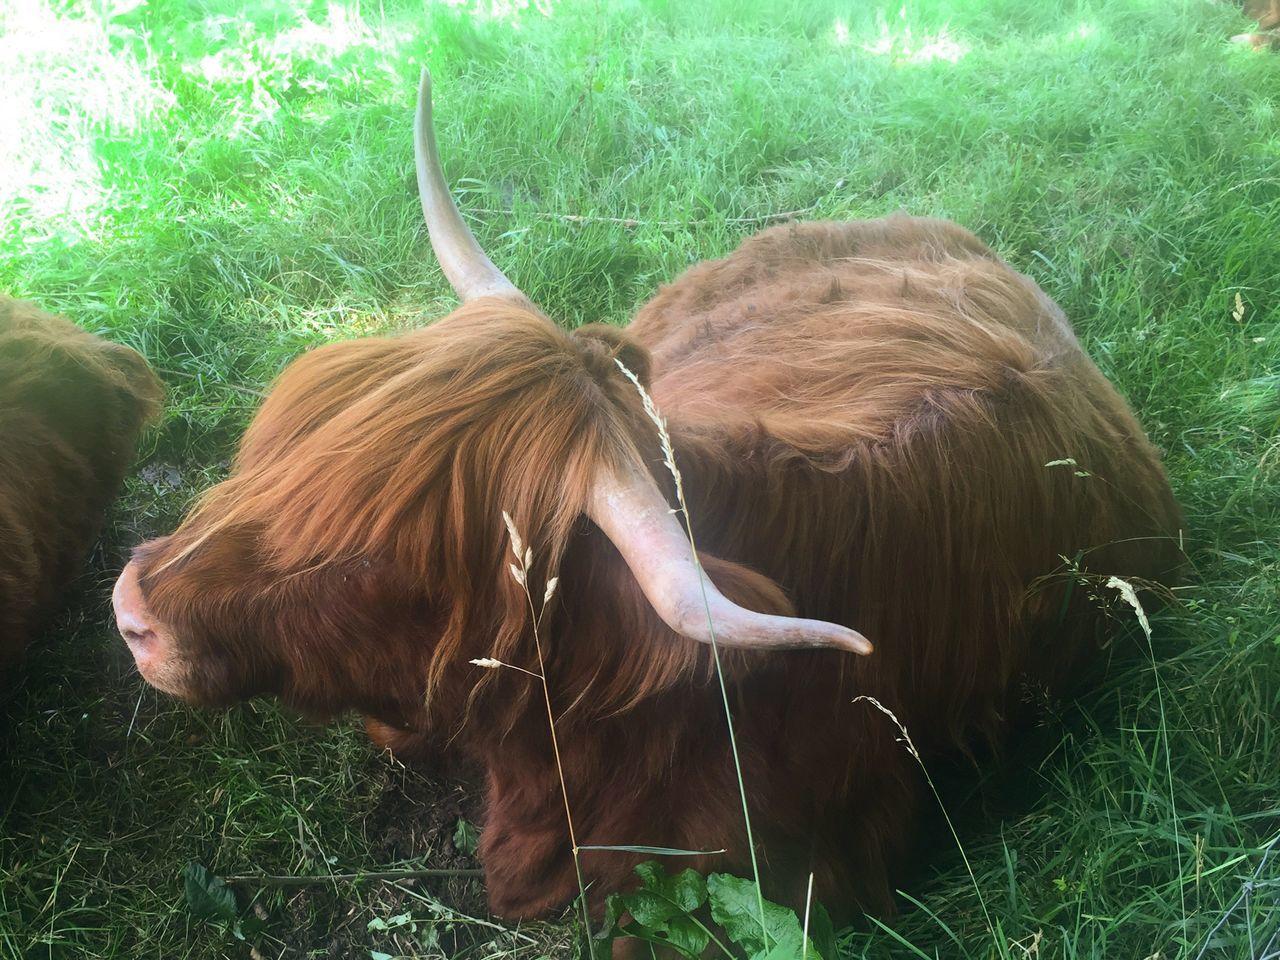 Highland Cow Landscape Summer #summertime #sun #TagsForLikes.com #hot #sunny #warm #fun #beautiful #sky #clearskys #season #seasons #instagood #instasummer #photooftheday #nature #TFLers #clearsky #bluesky #vacationtime #weather #summerweather #sunshine #summertimeshine